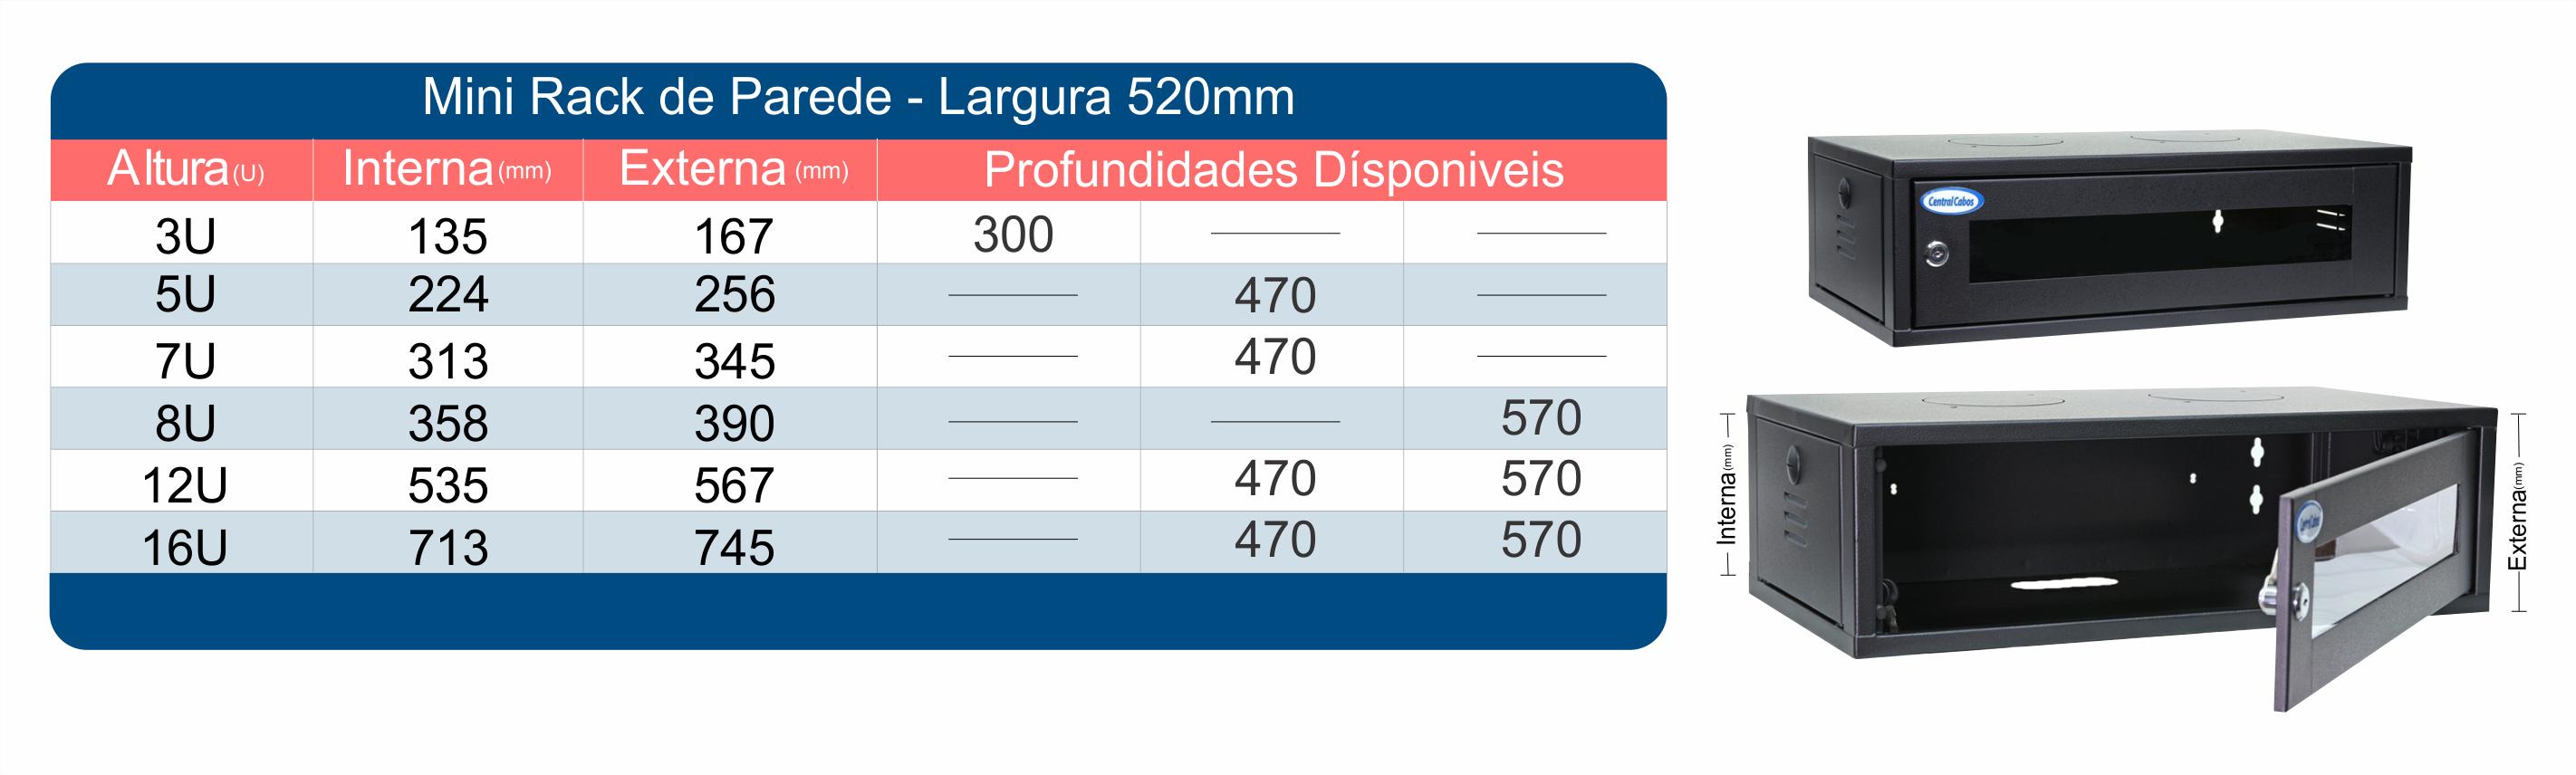 Tabela de Rack de Parede